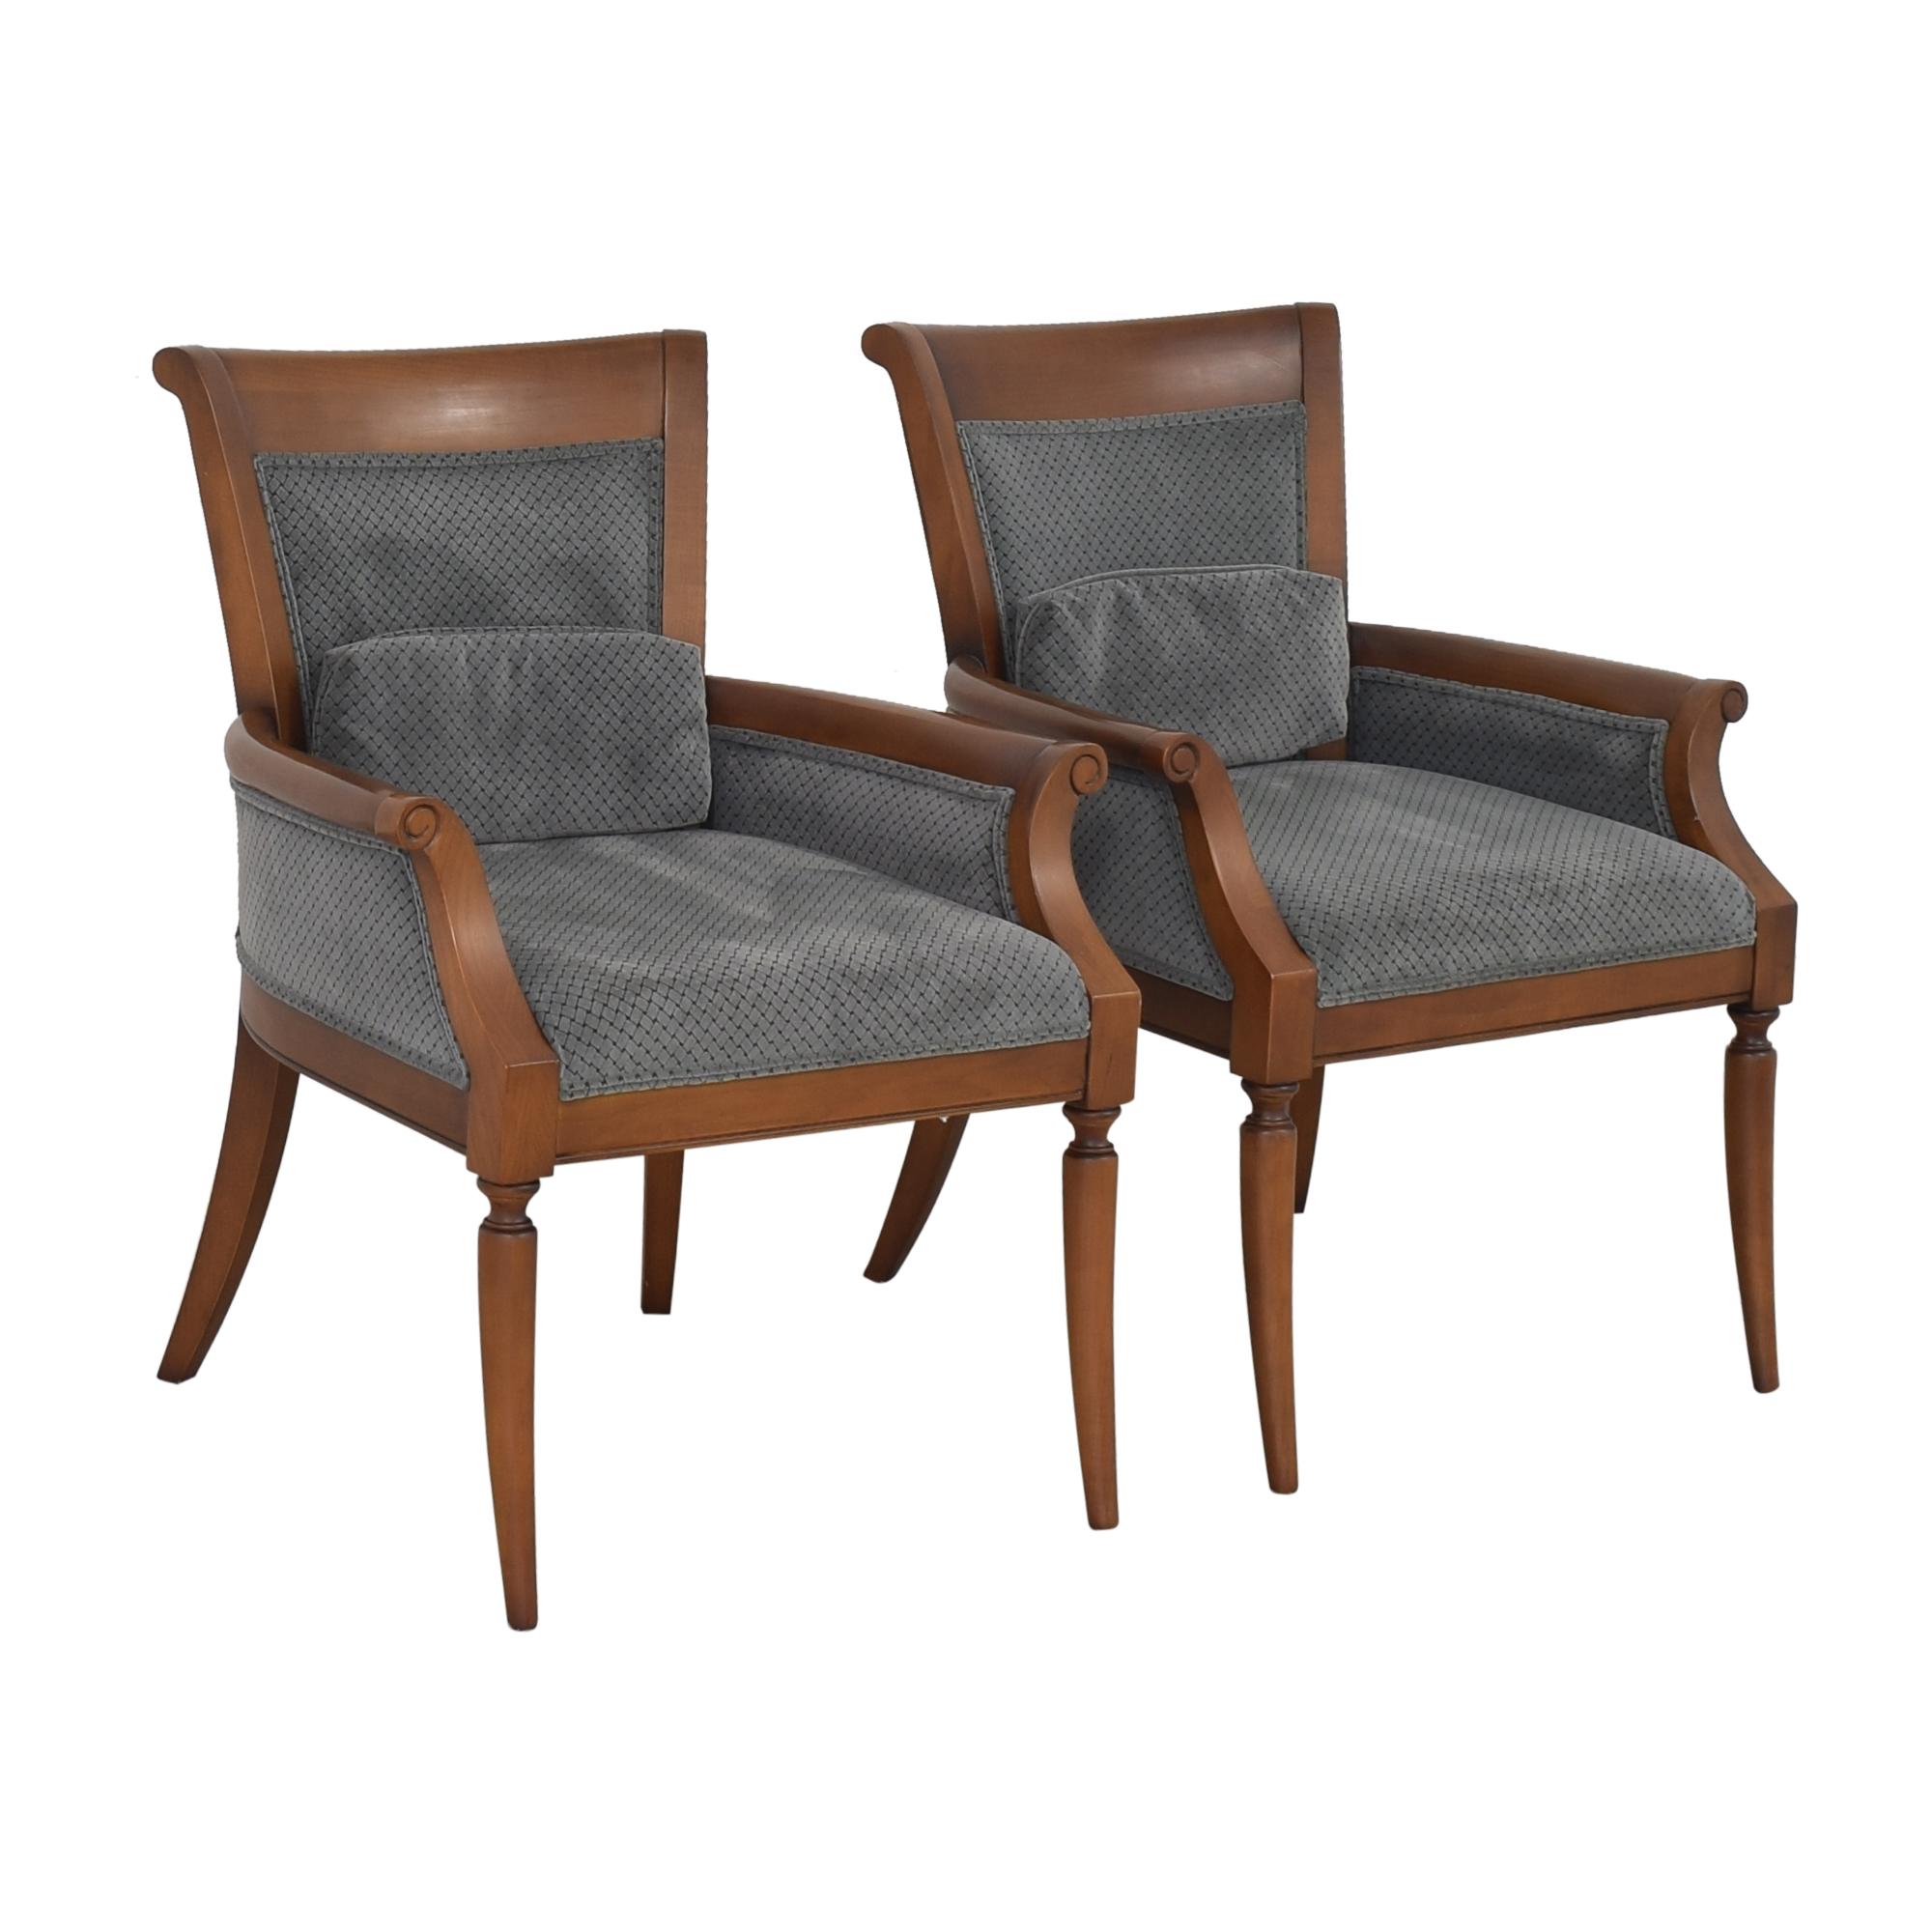 Hekman Aberdeen Accent Chairs Hekman Furniture